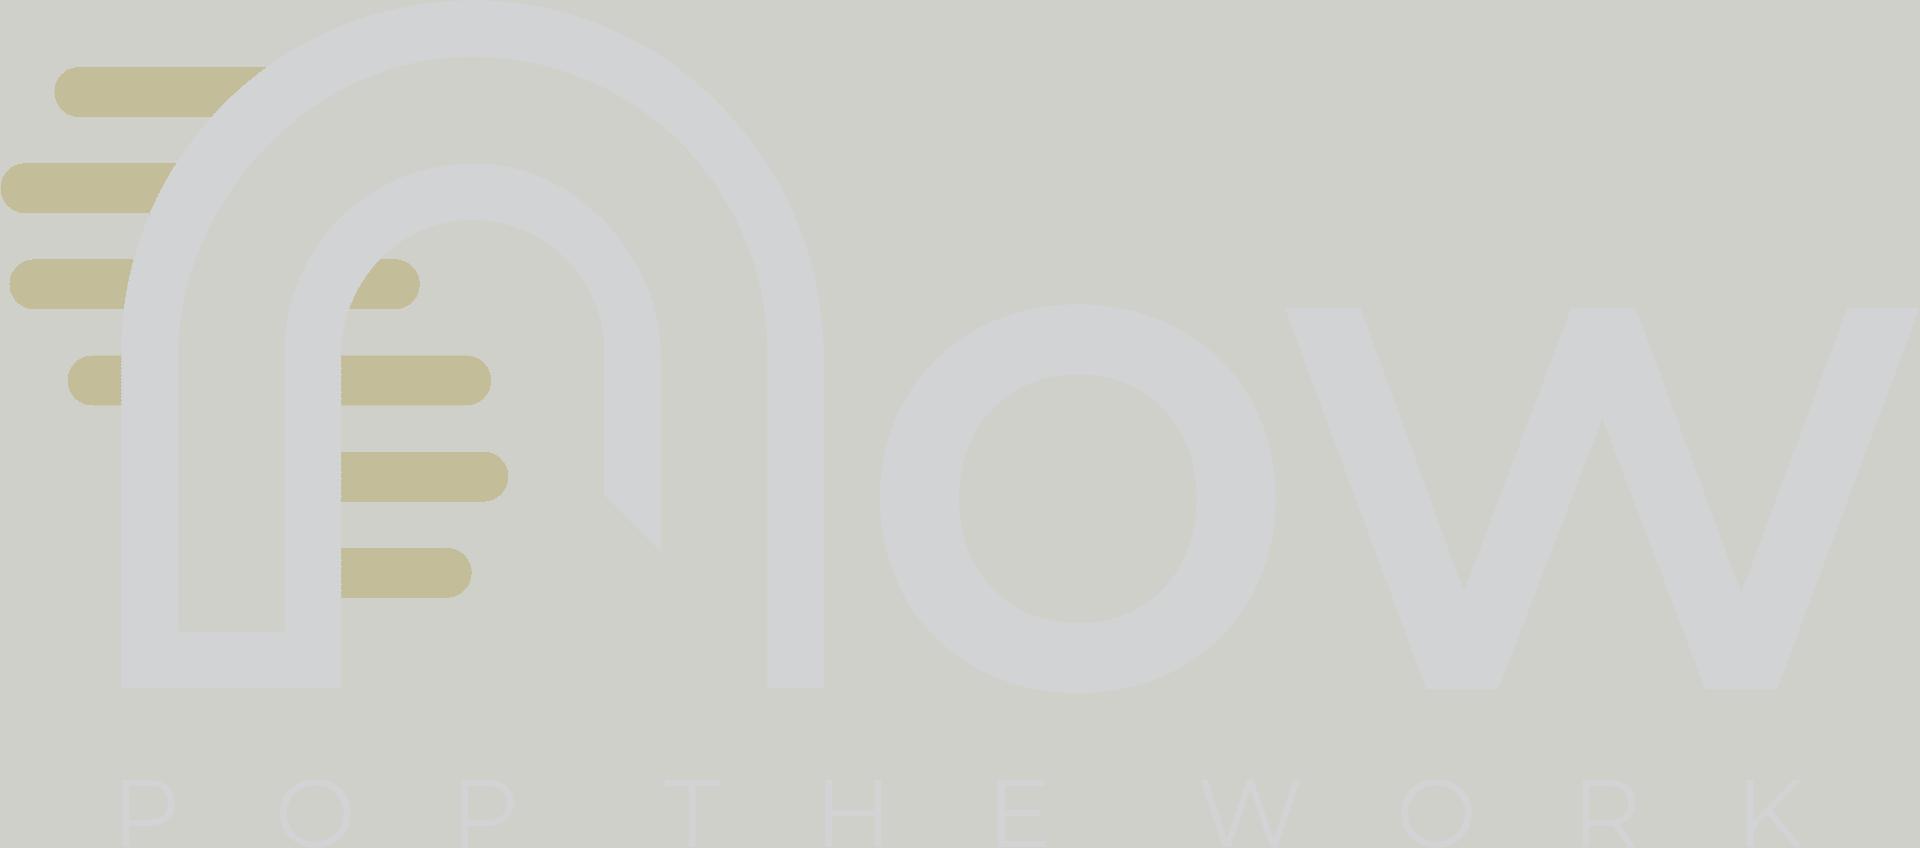 logo-now-coworking-5-1920x848